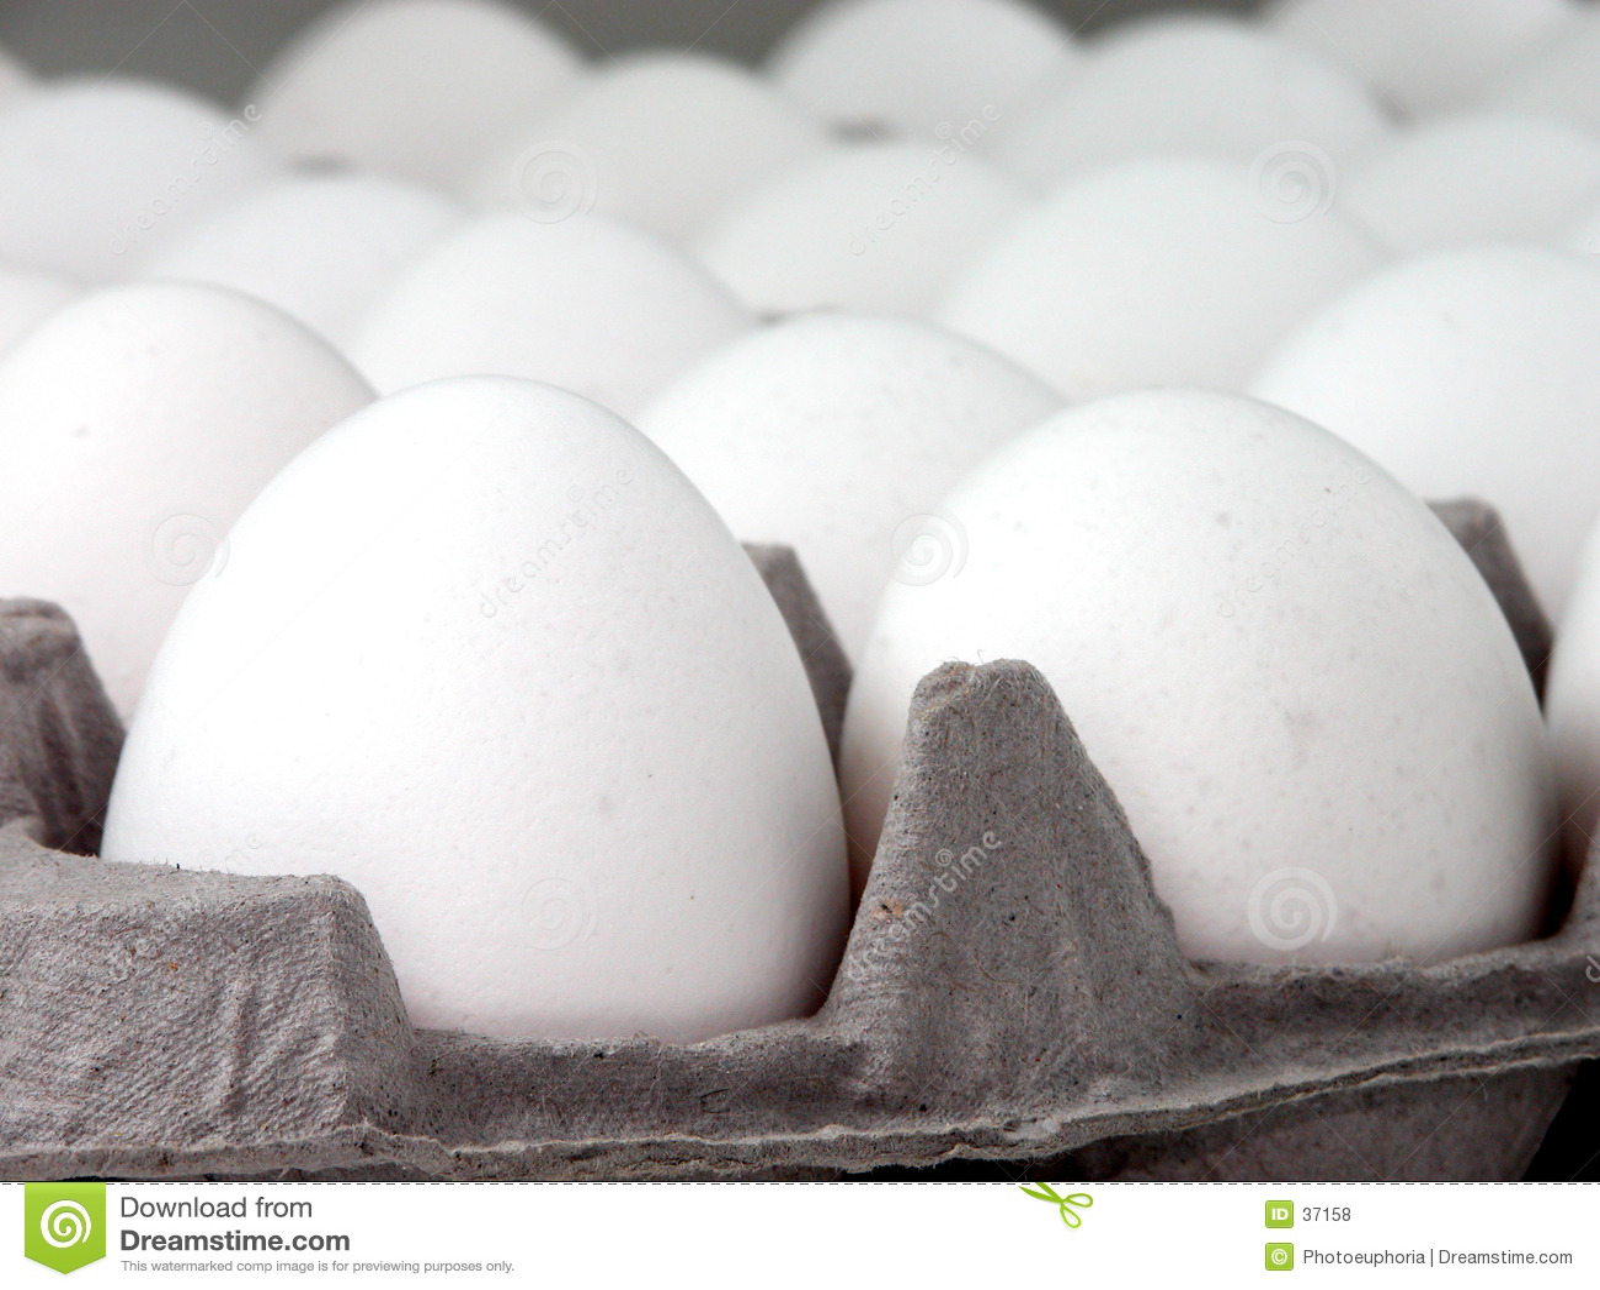 Food: Egg Close-up